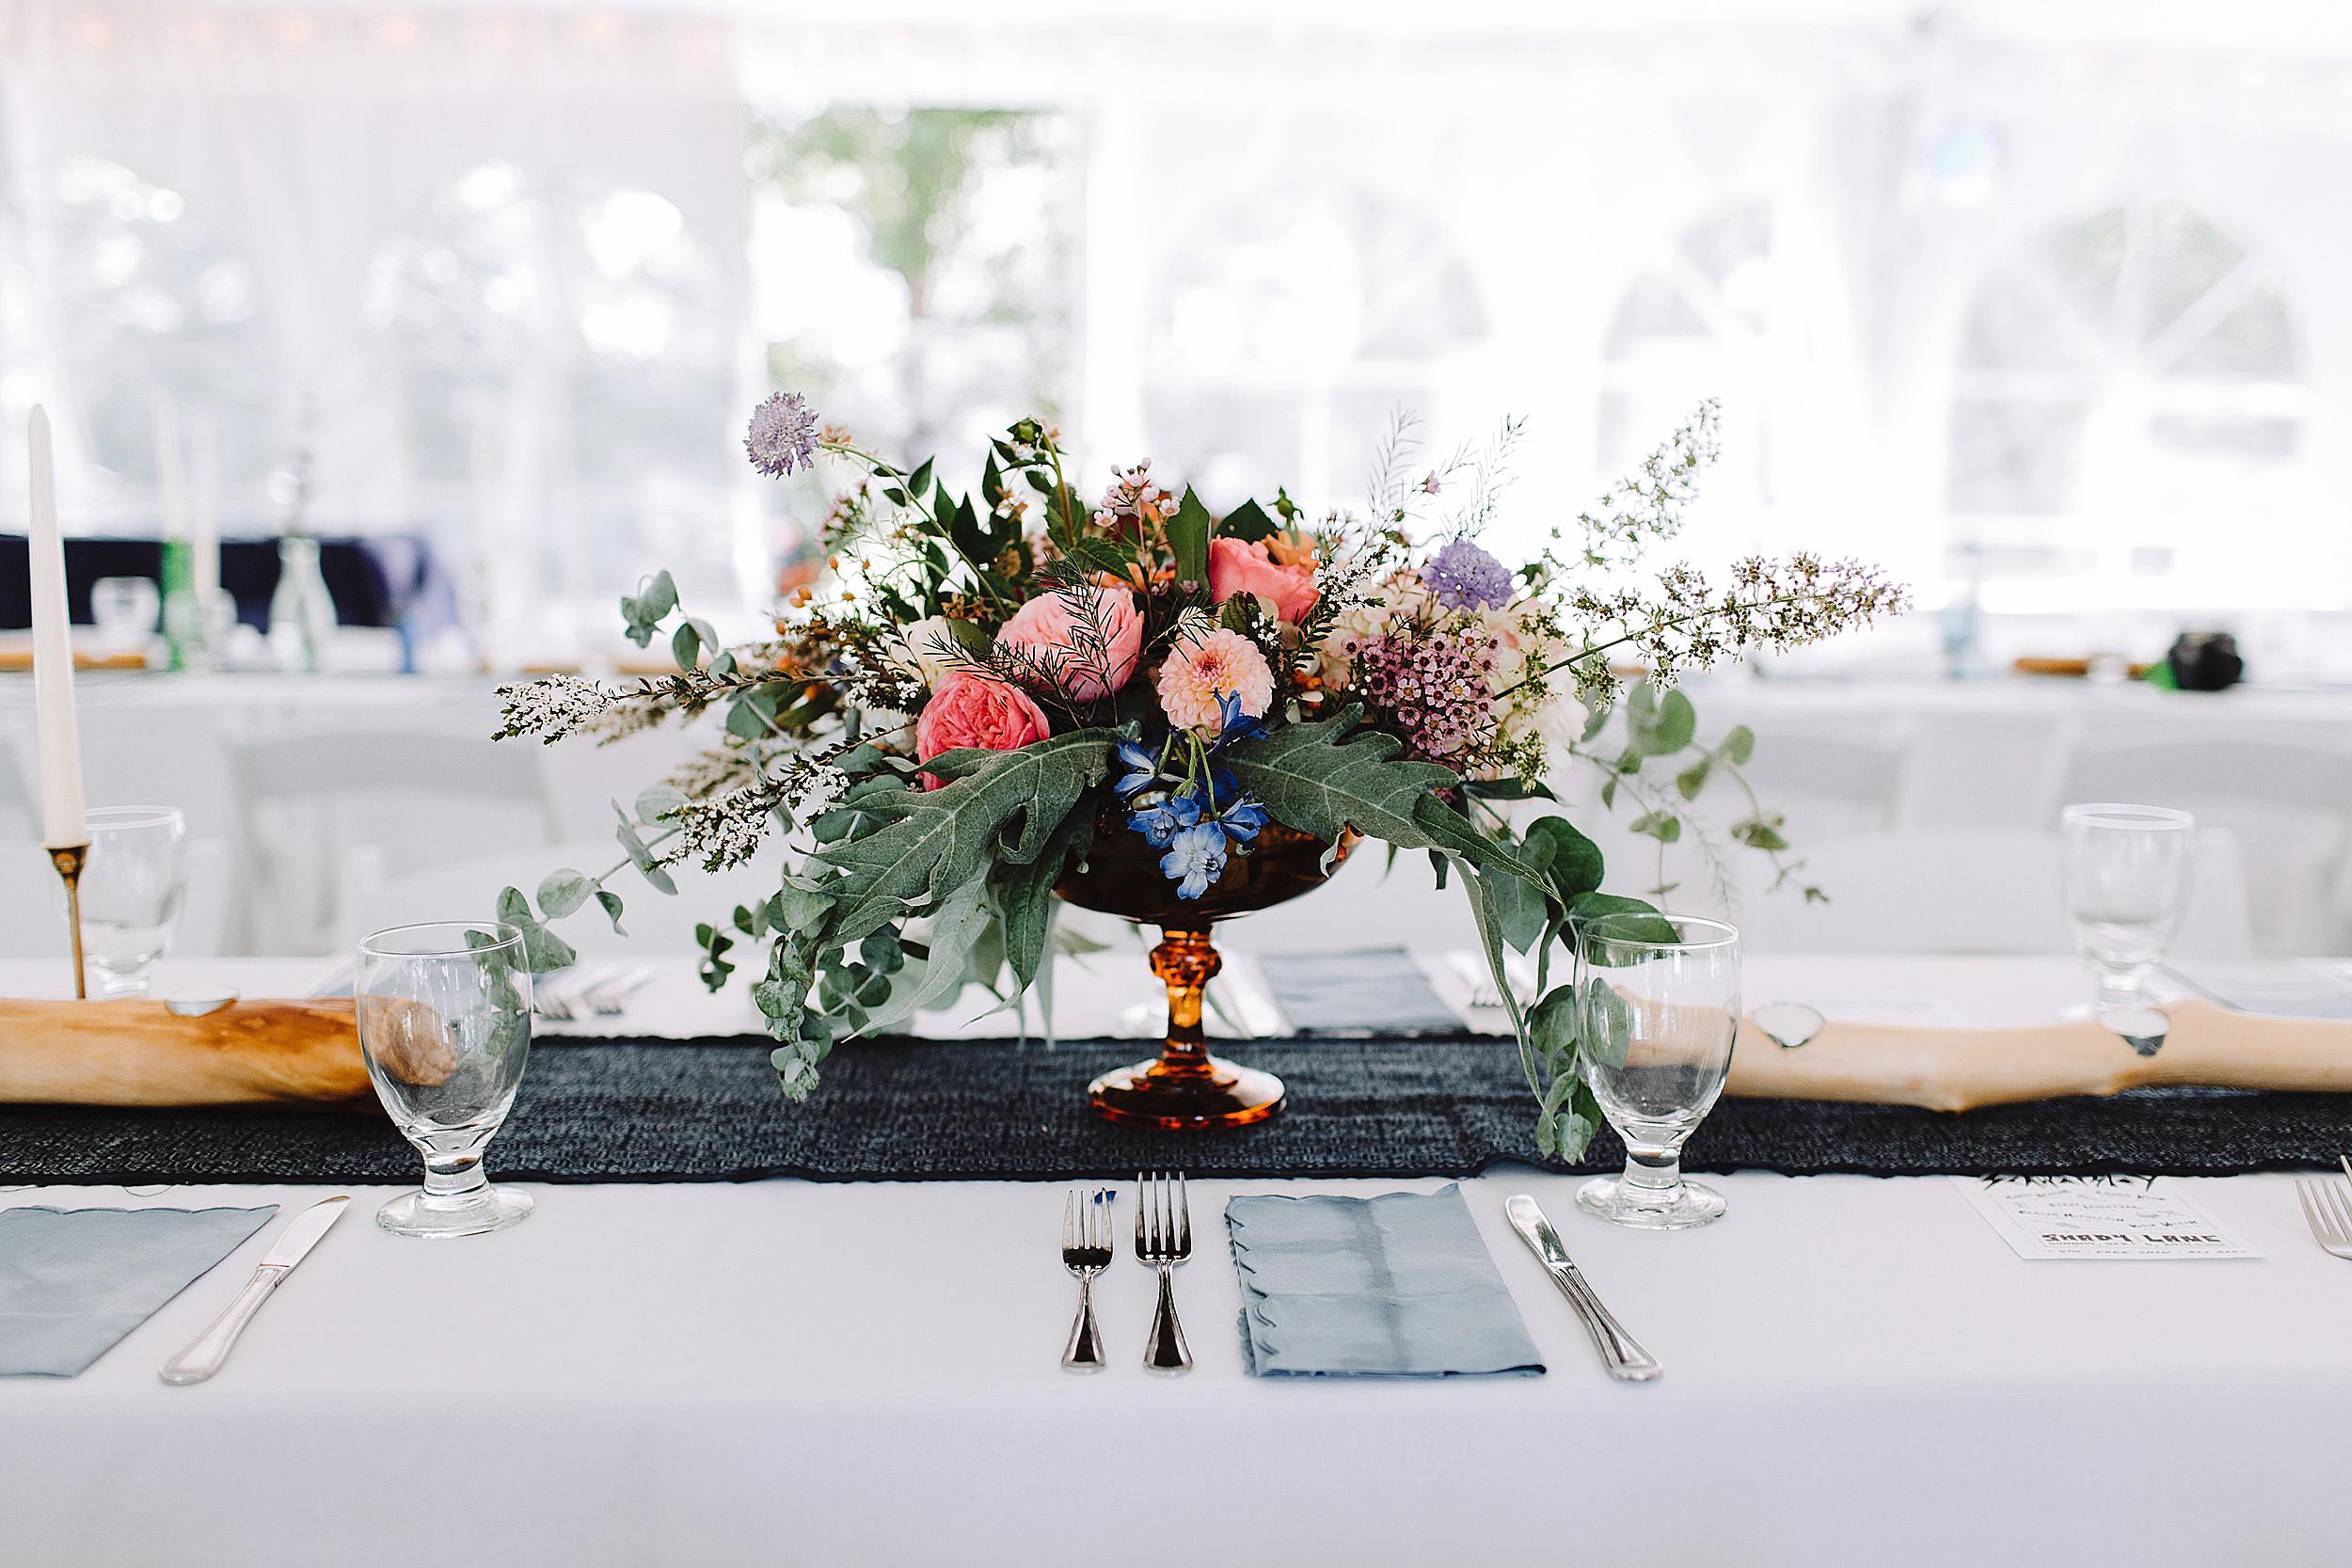 historic_shady_lane_wedding_with_love_and_embers-011.JPG